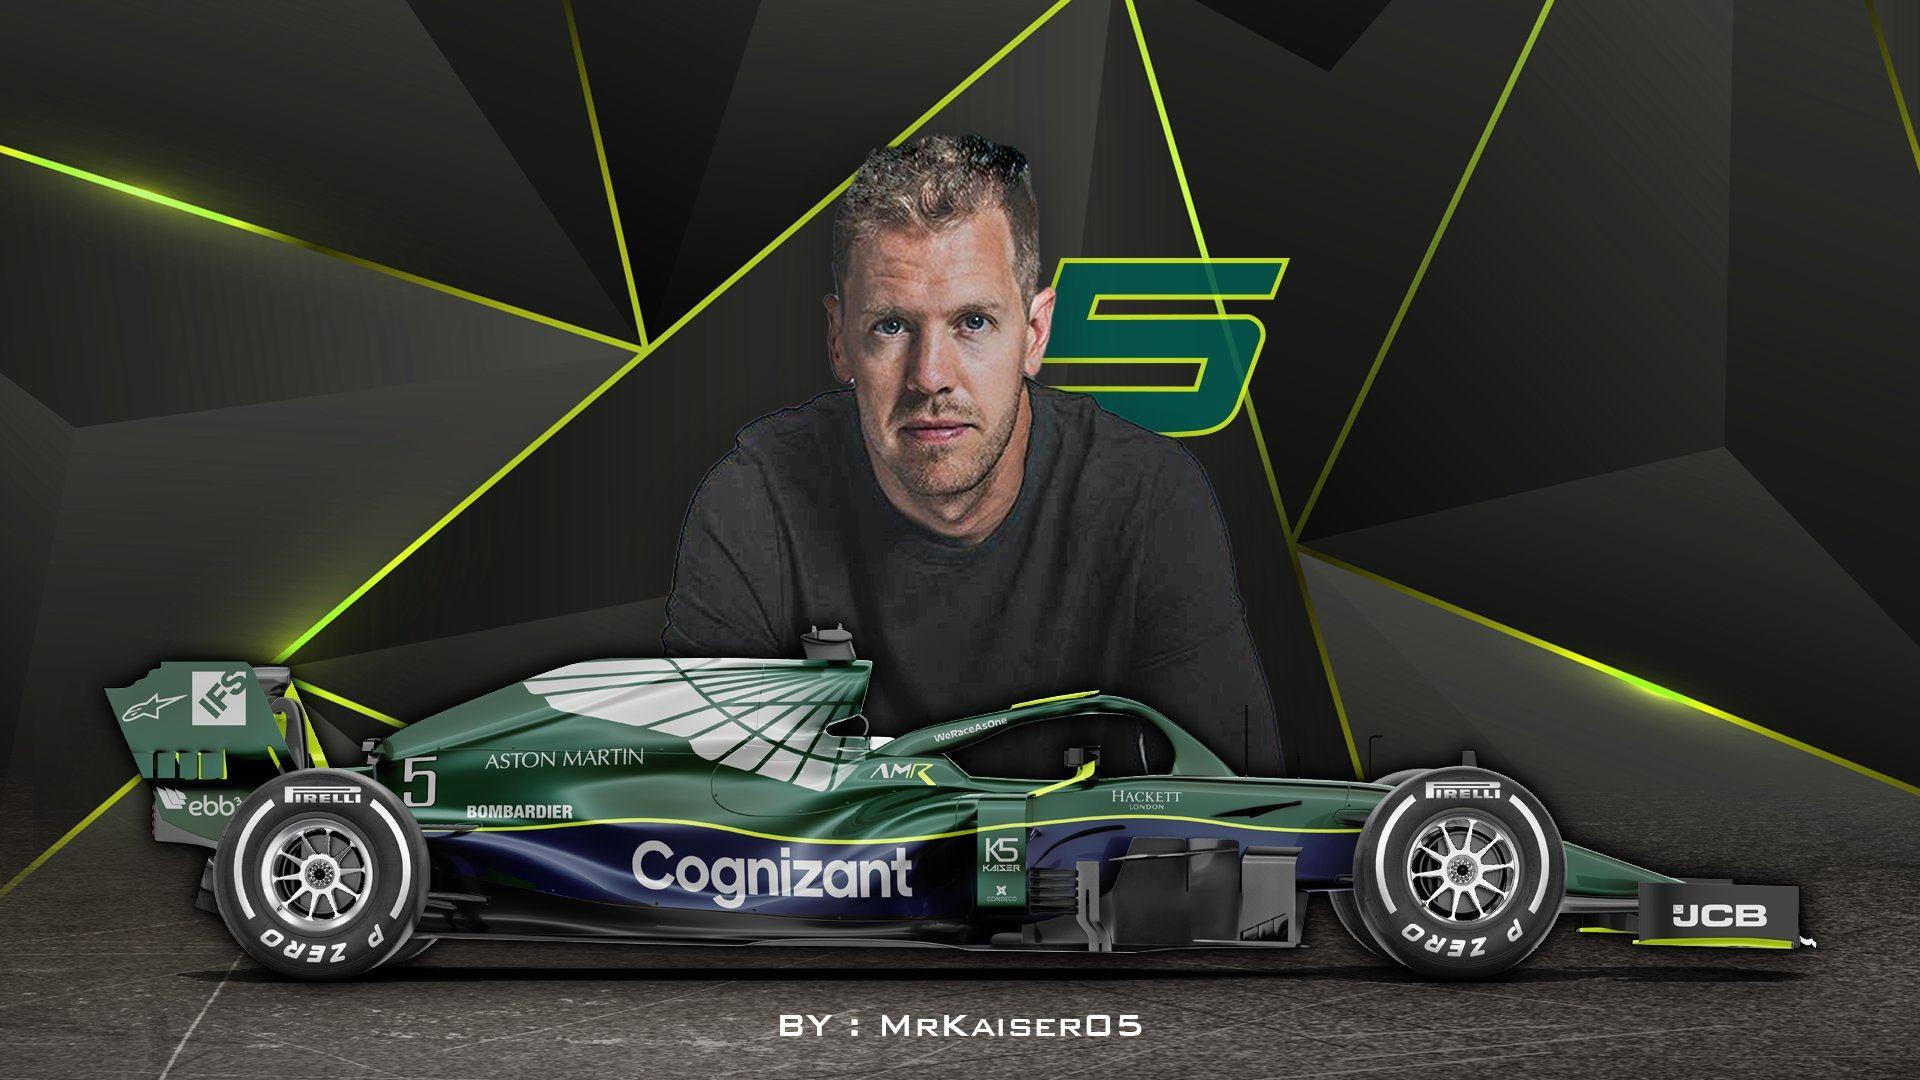 Aston Martin Cognizant F1 Team Teams Background 4